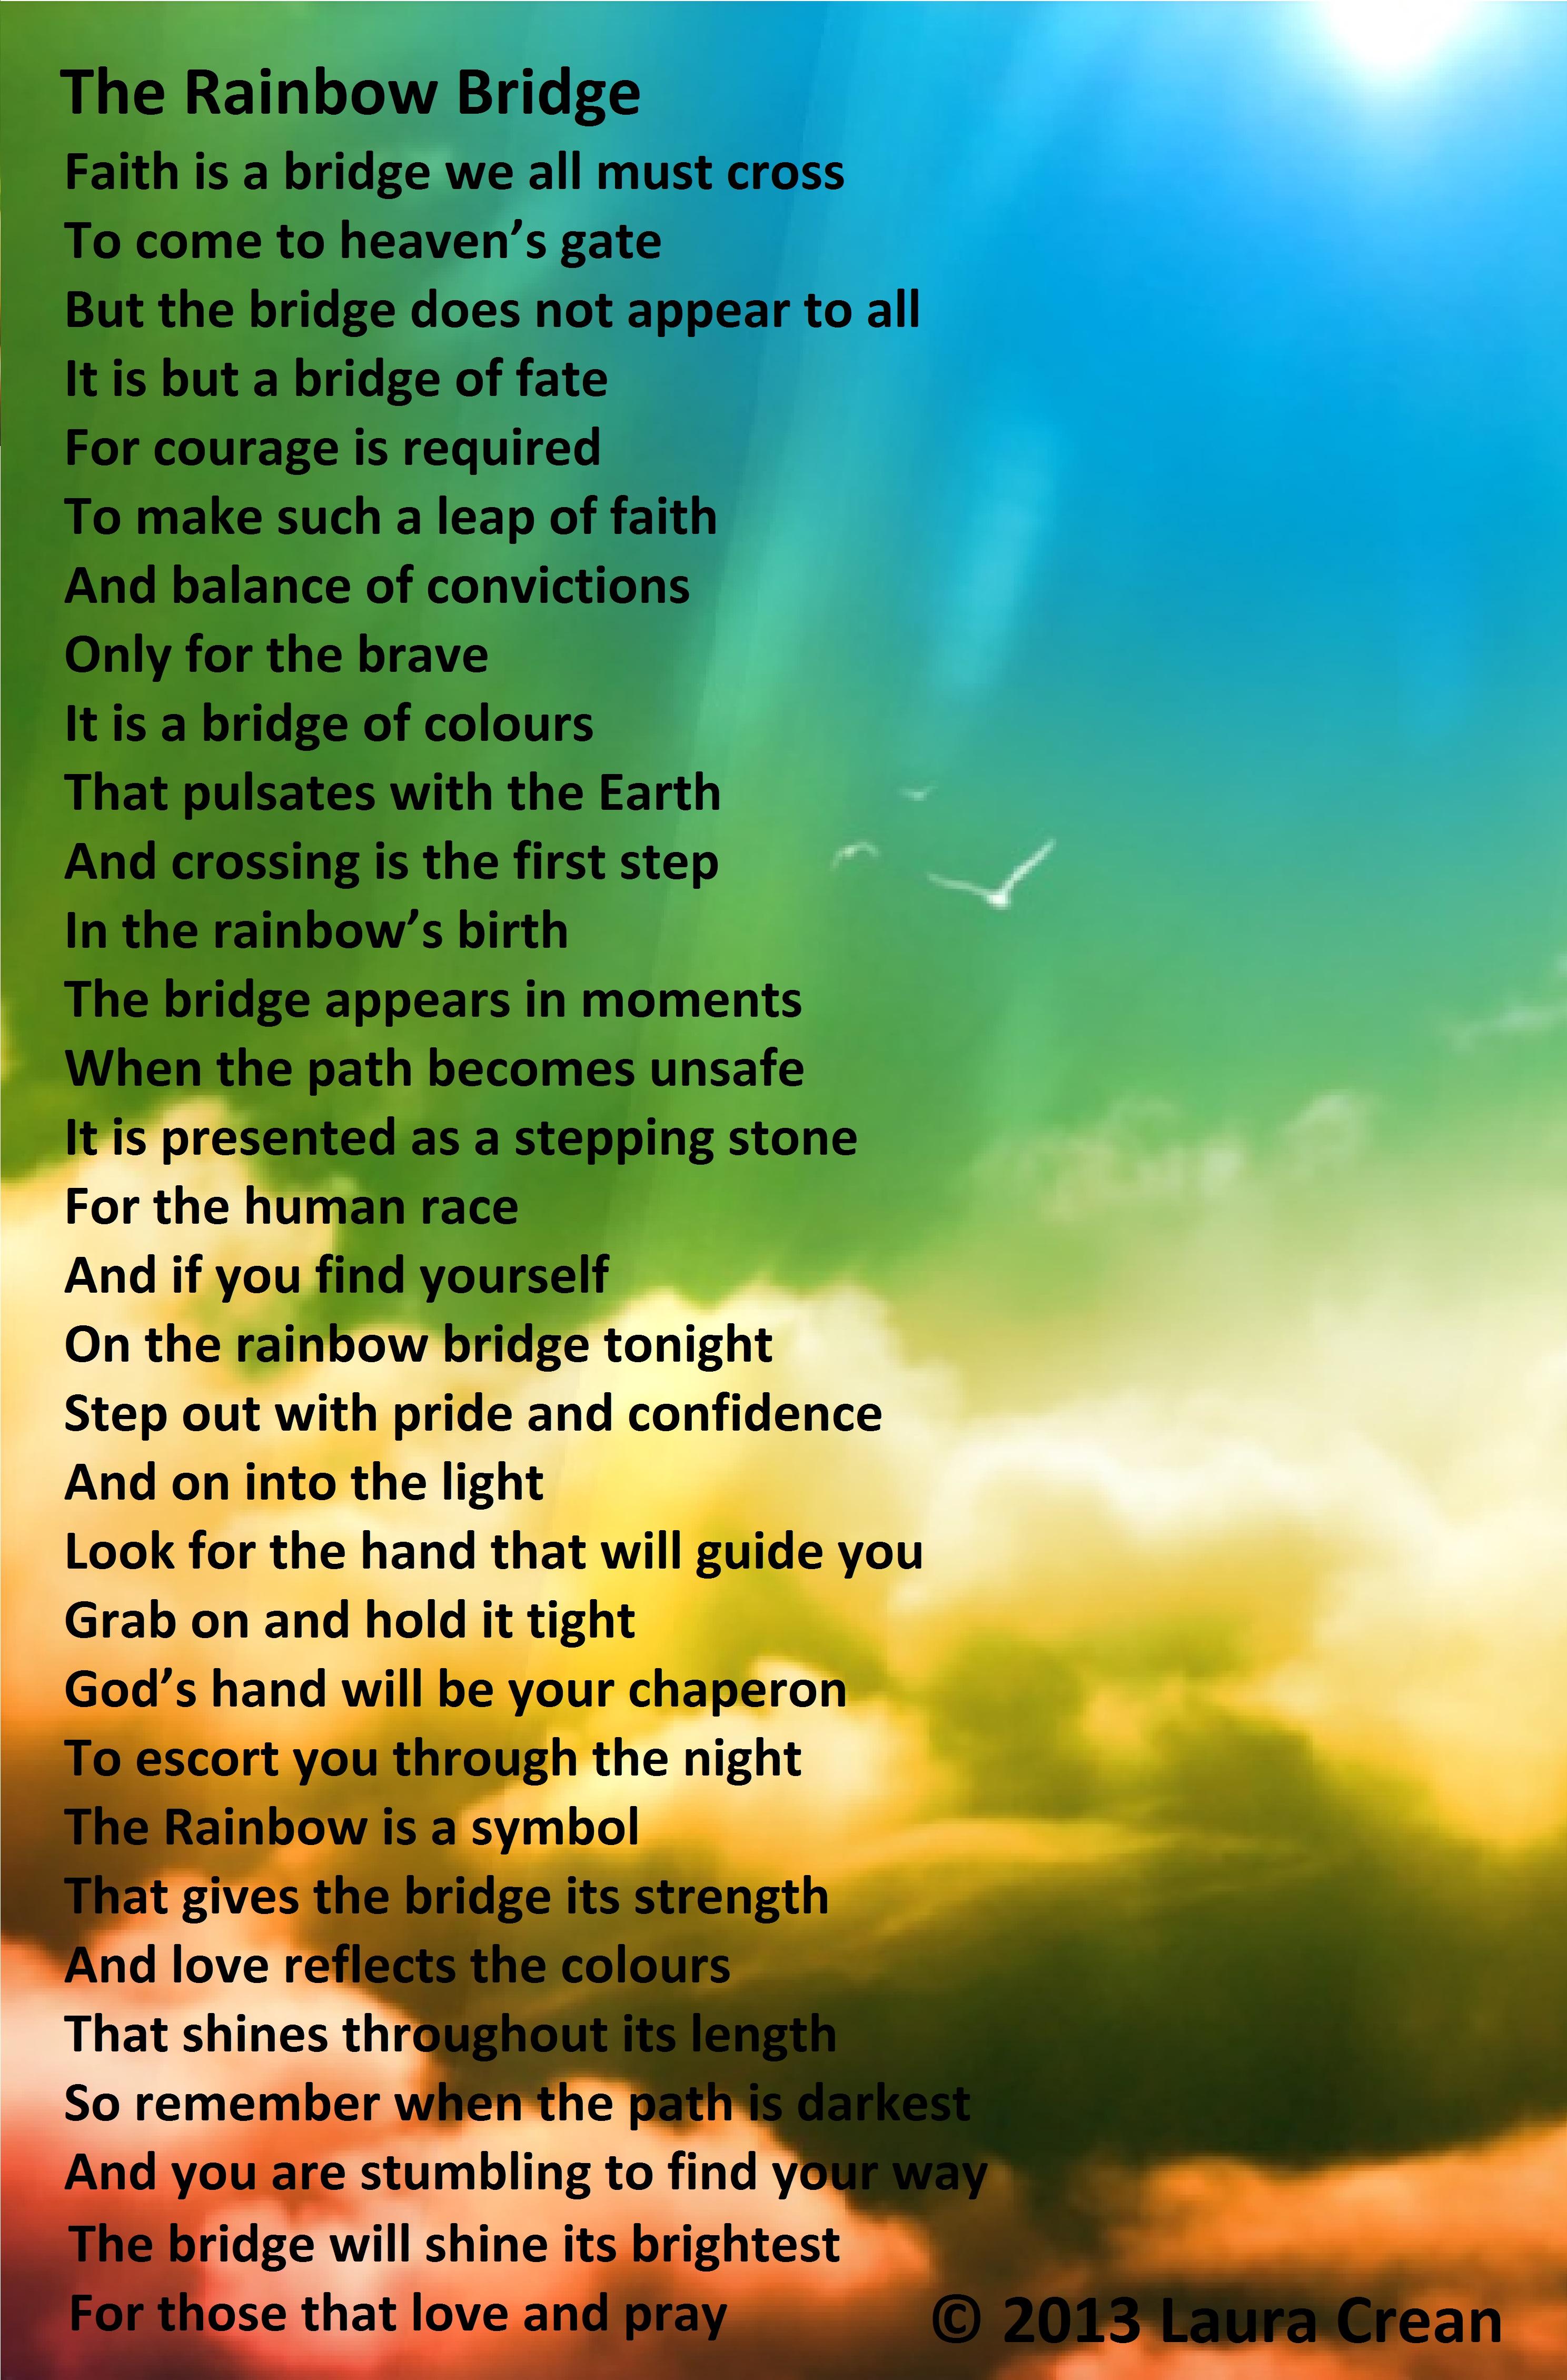 The Rainbow Bridge By Laura Crean